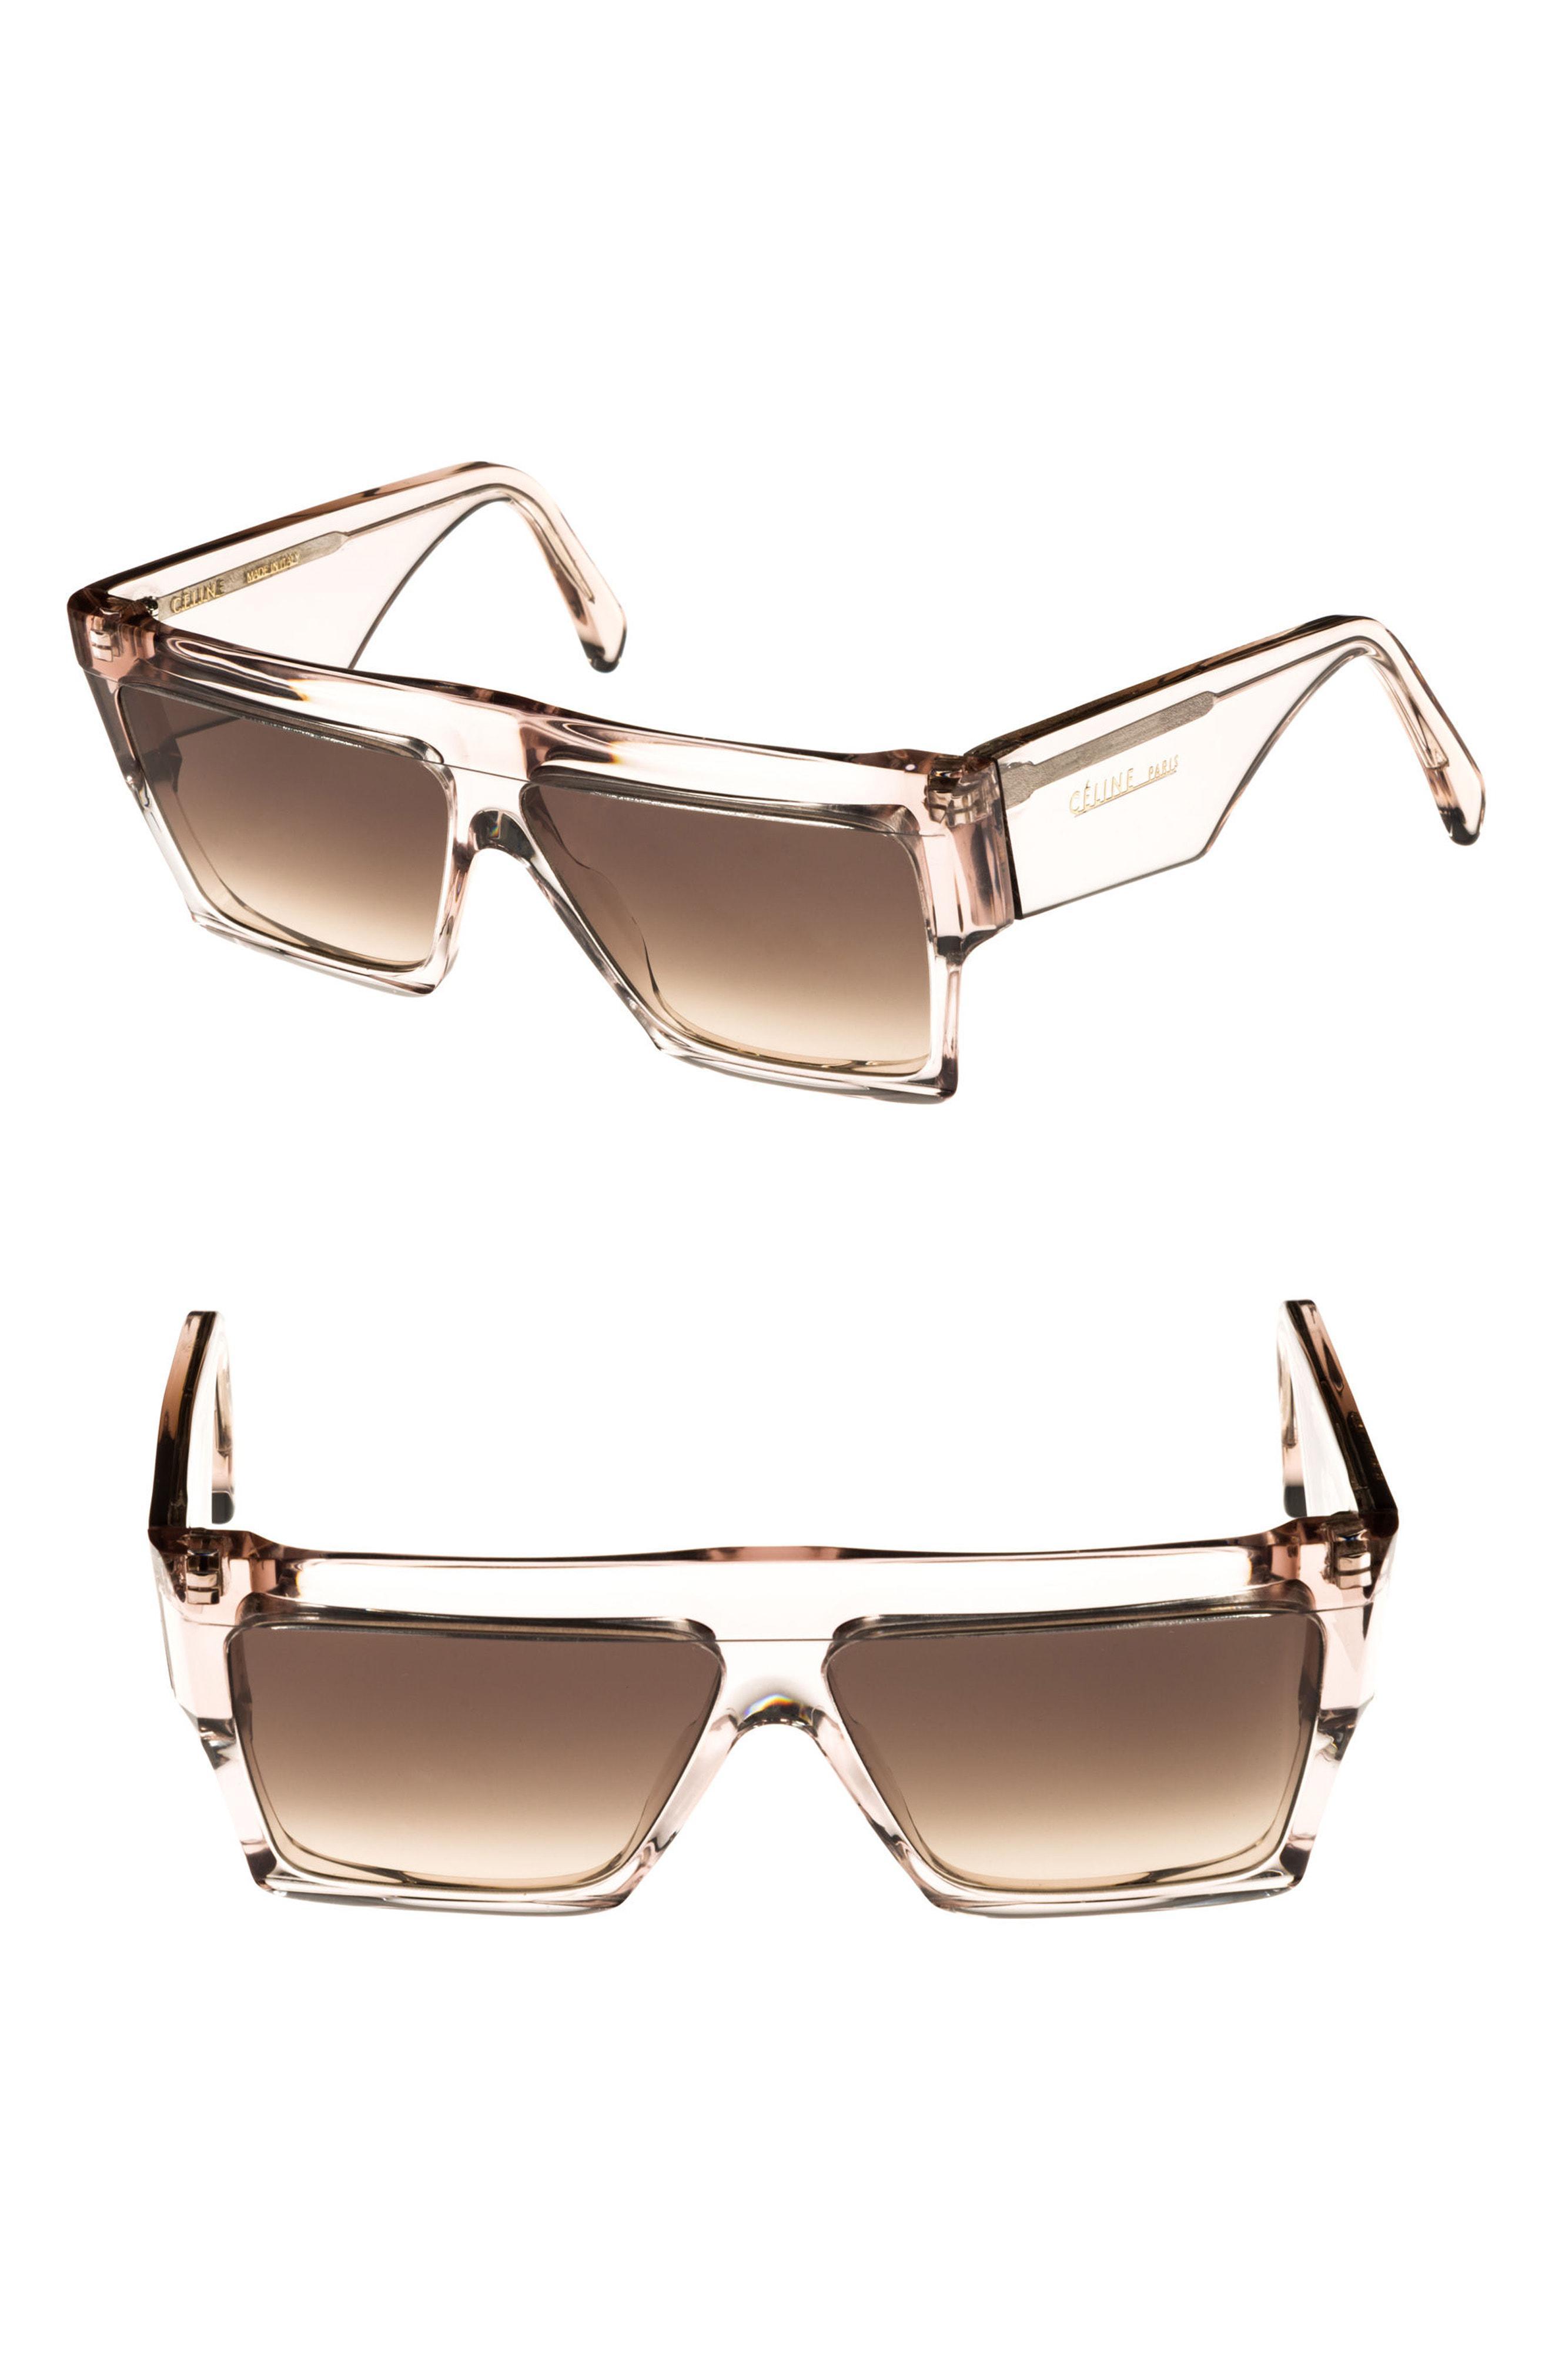 94b5bf45590 Céline - 60mm Flat Top Sunglasses - Transparent Clear  Brown - Lyst. View  fullscreen